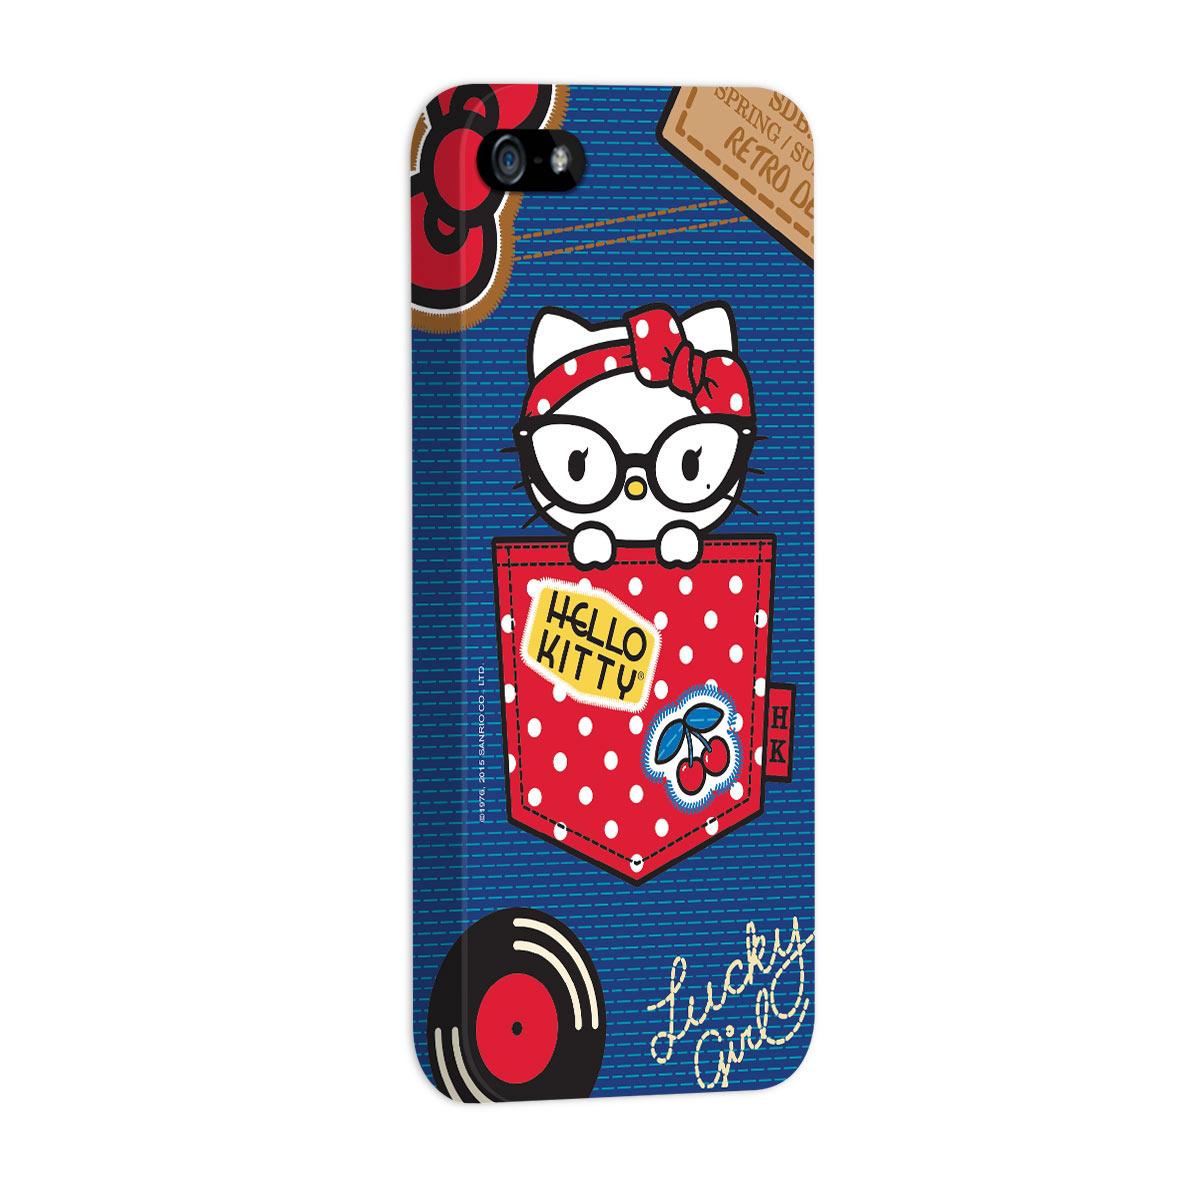 Capa para iPhone 5/5S Hello Kitty Retro Denim